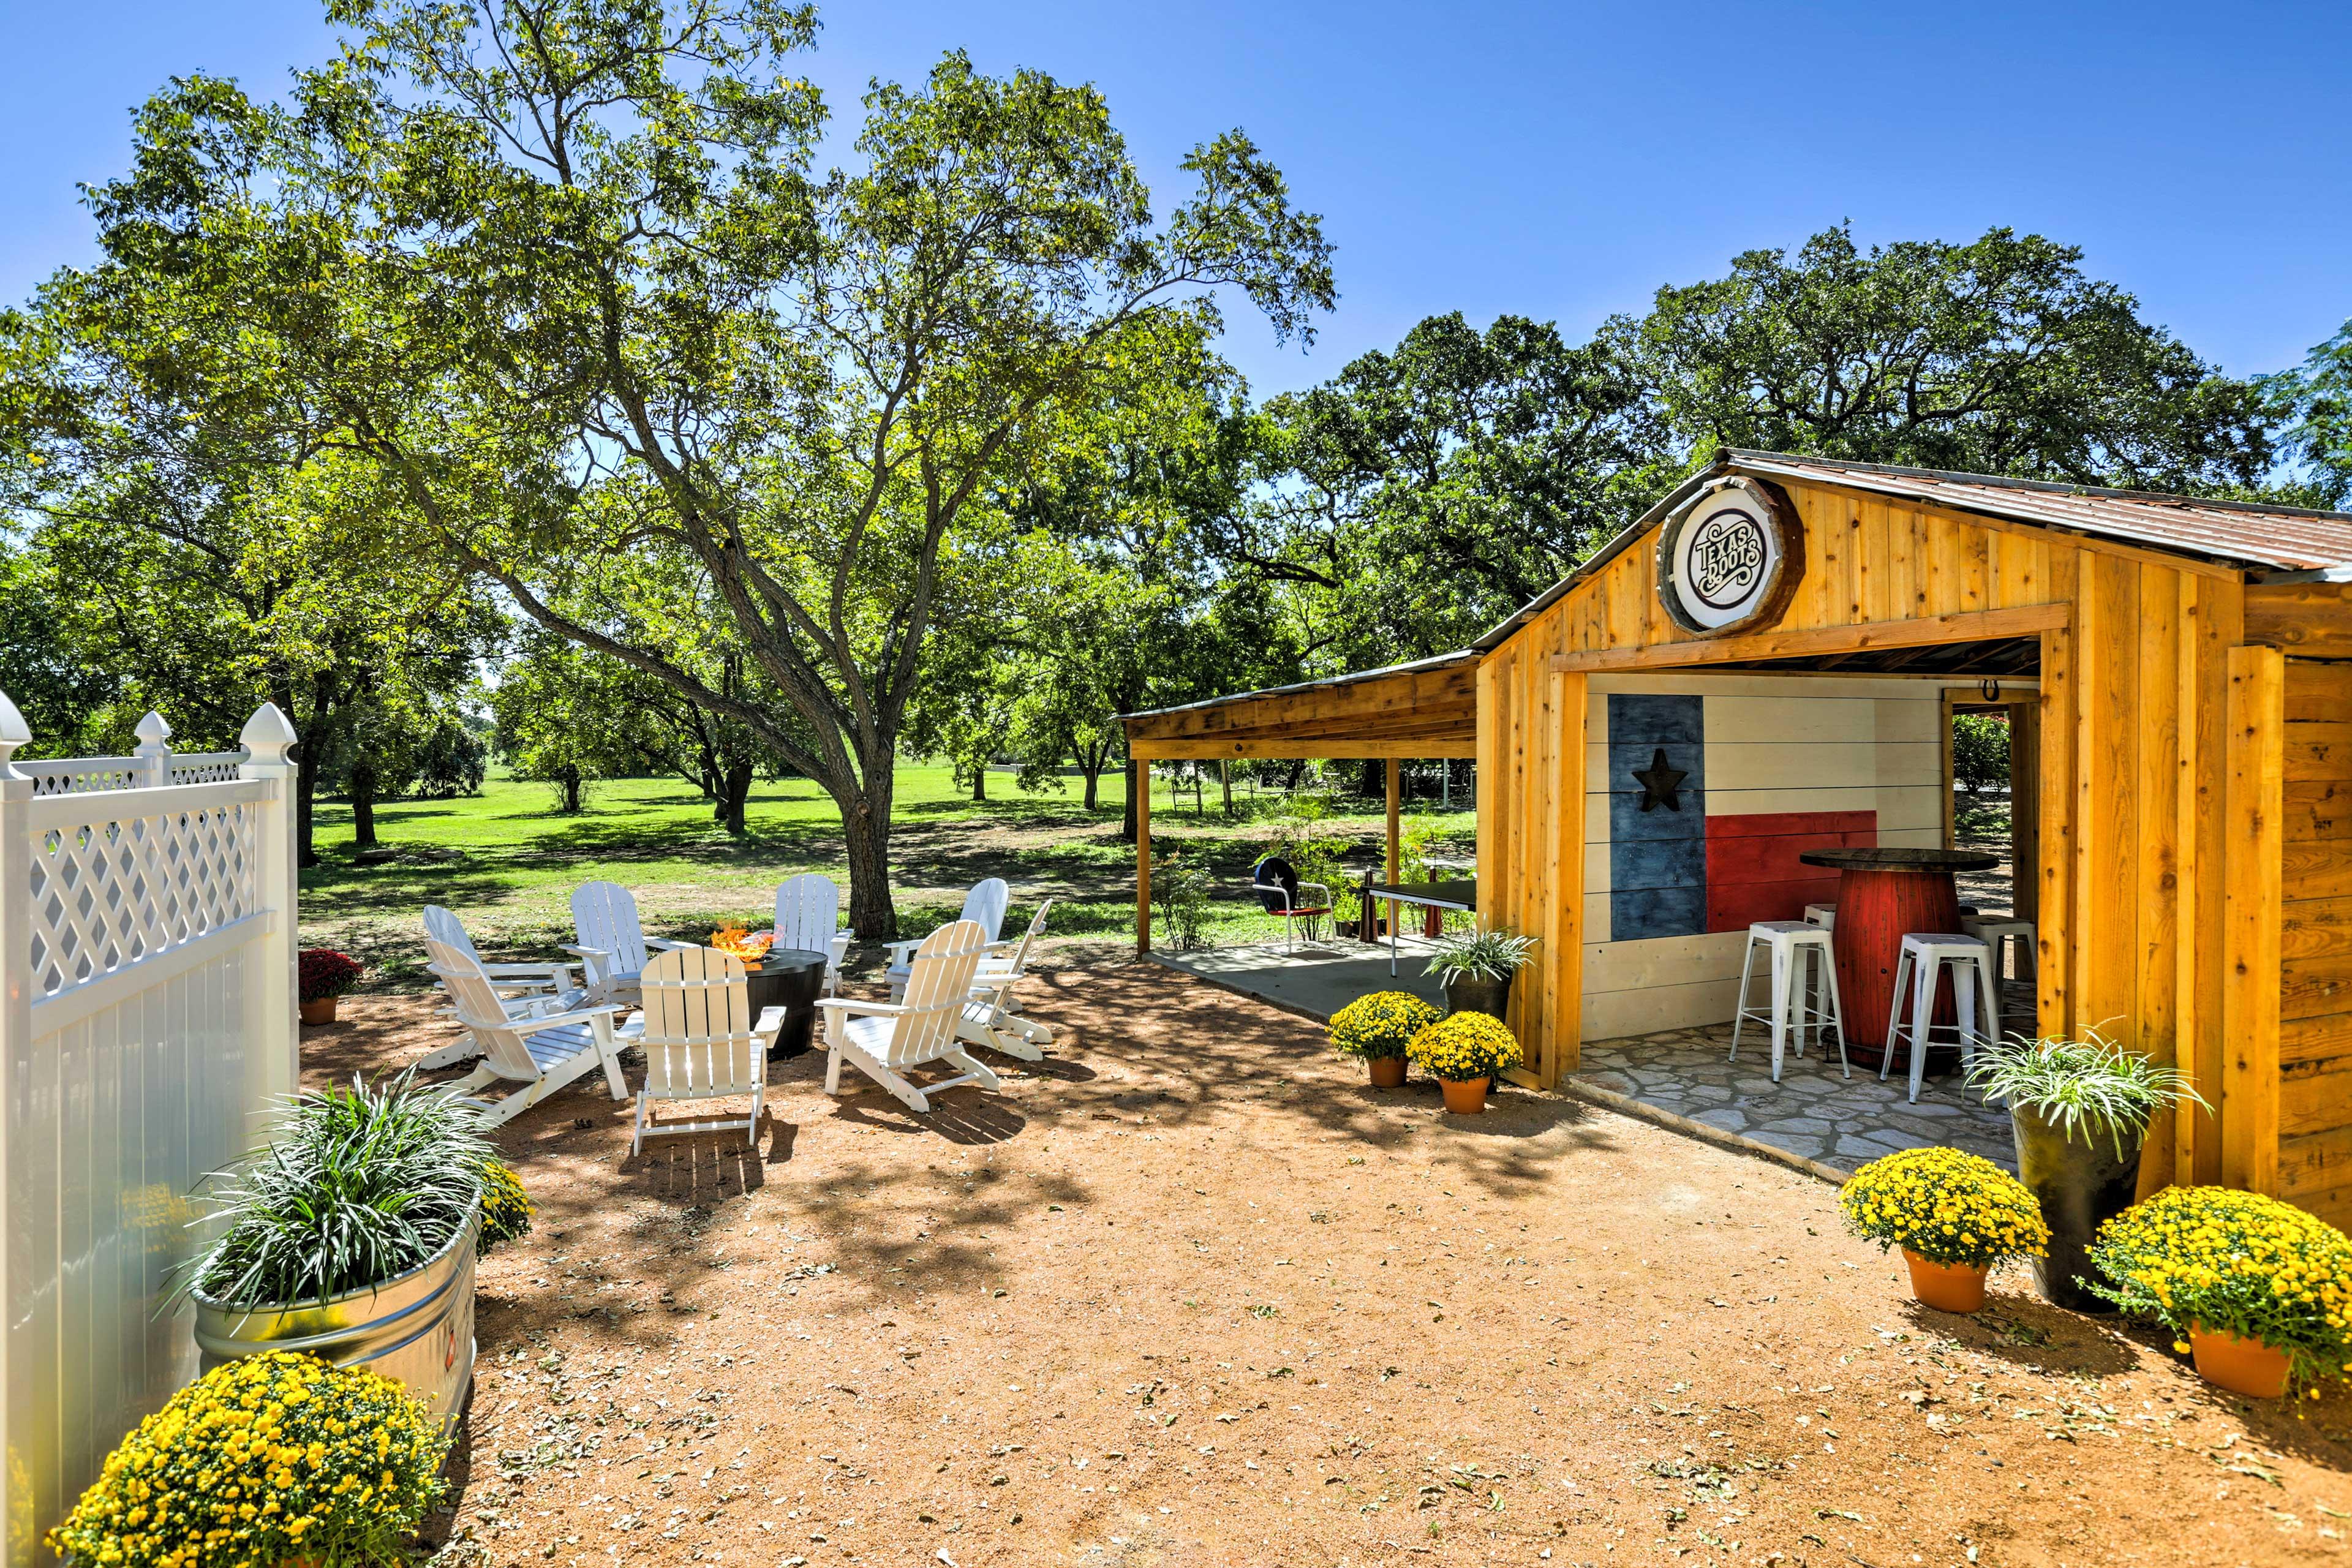 Have a memorable Texas getaway at 'Texas Roots,' a 3-bedroom, 2-bathroom vacation rental house in Fredericksburg.